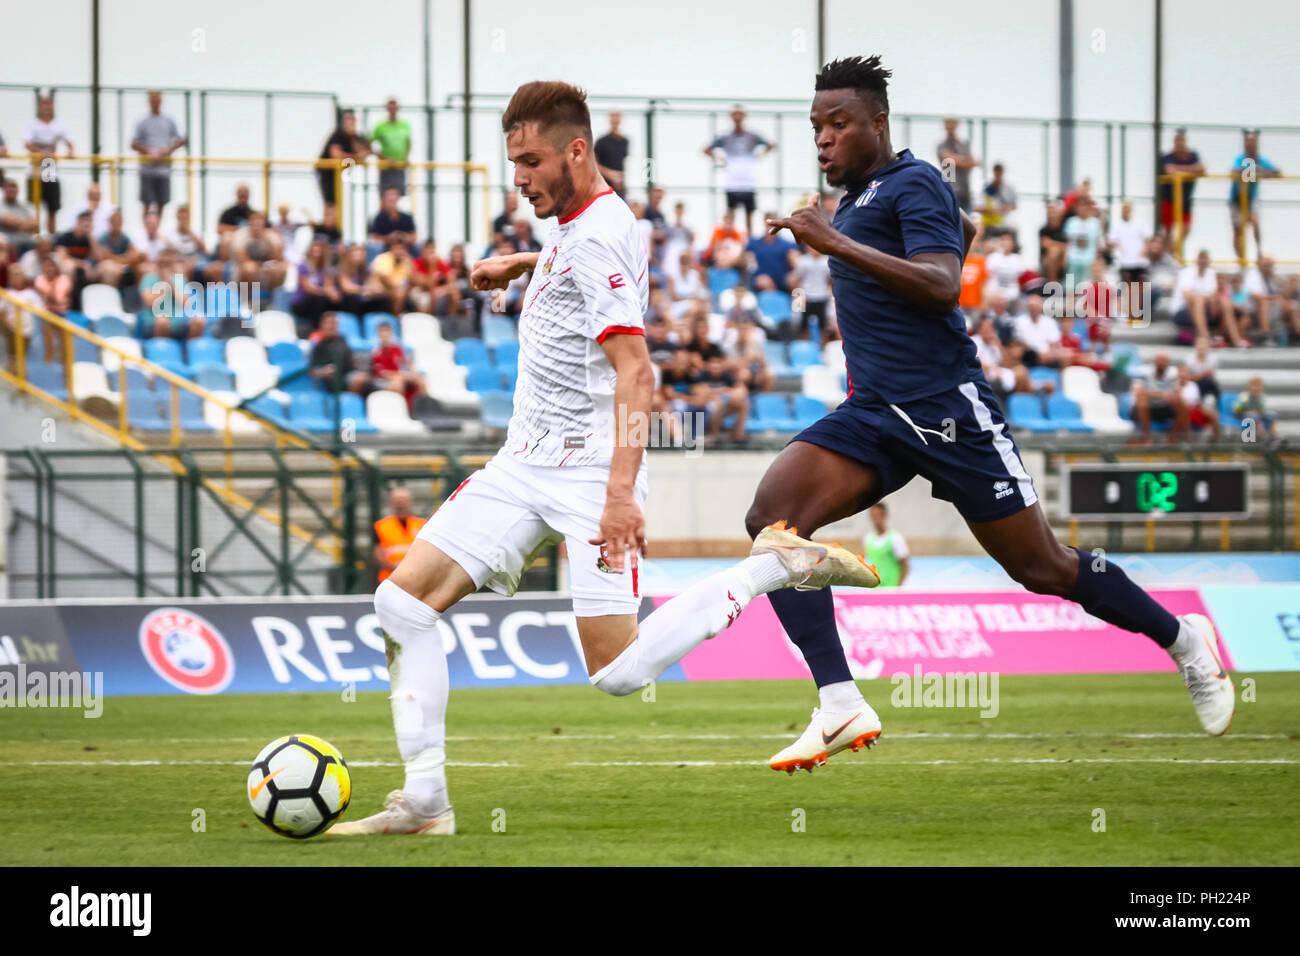 Velika Gorica, Croatia - 25th, August 2018 : The first football Croatian league Hrvatski Telekom, football game between Hnk Gorica and Rudes on Gorica - Stock Image